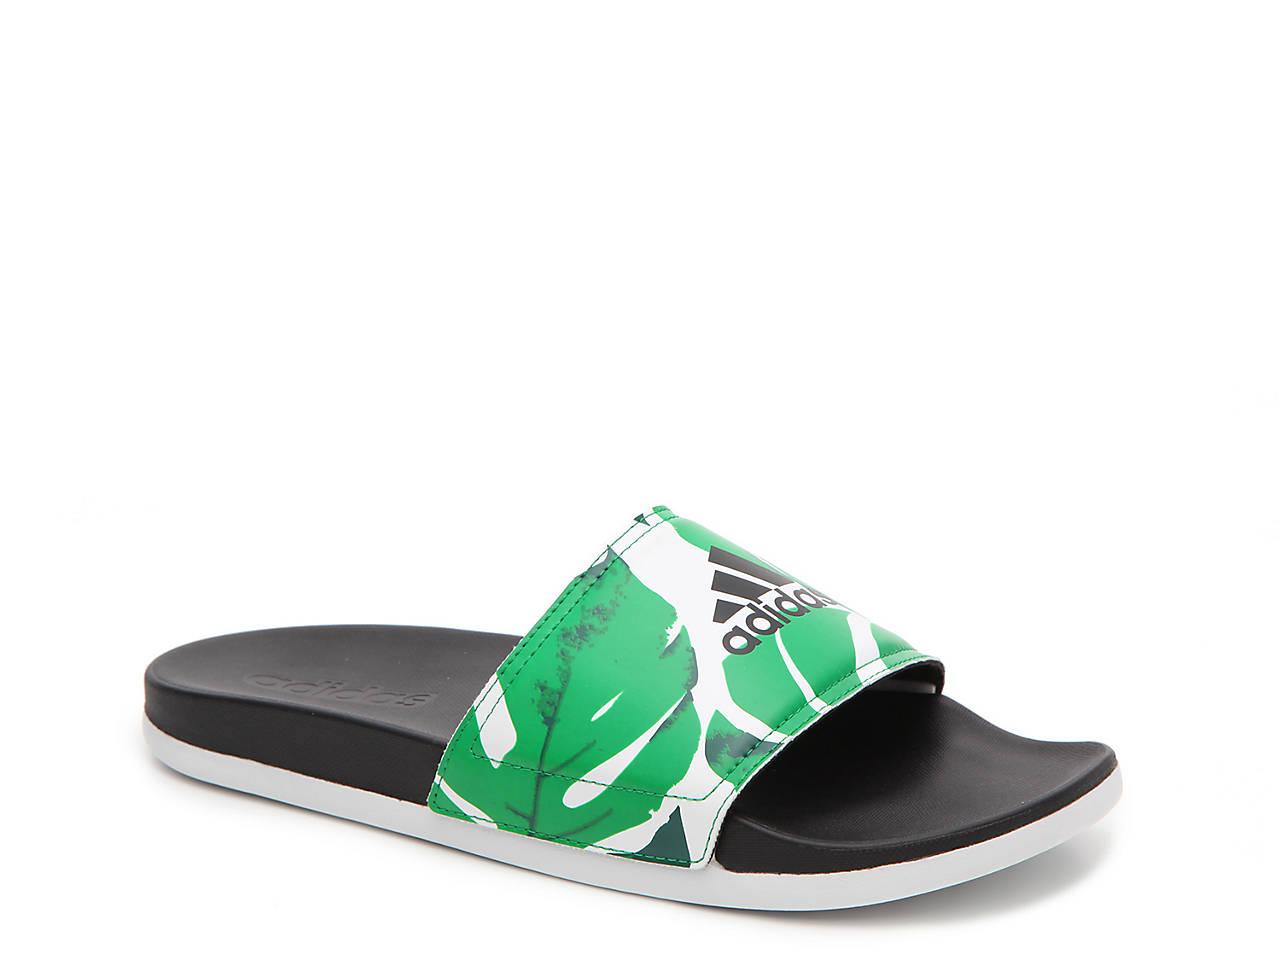 28cbc9dac603e3 adidas Adilette Cloudfoam Ultra Slide Sandal Women s Shoes